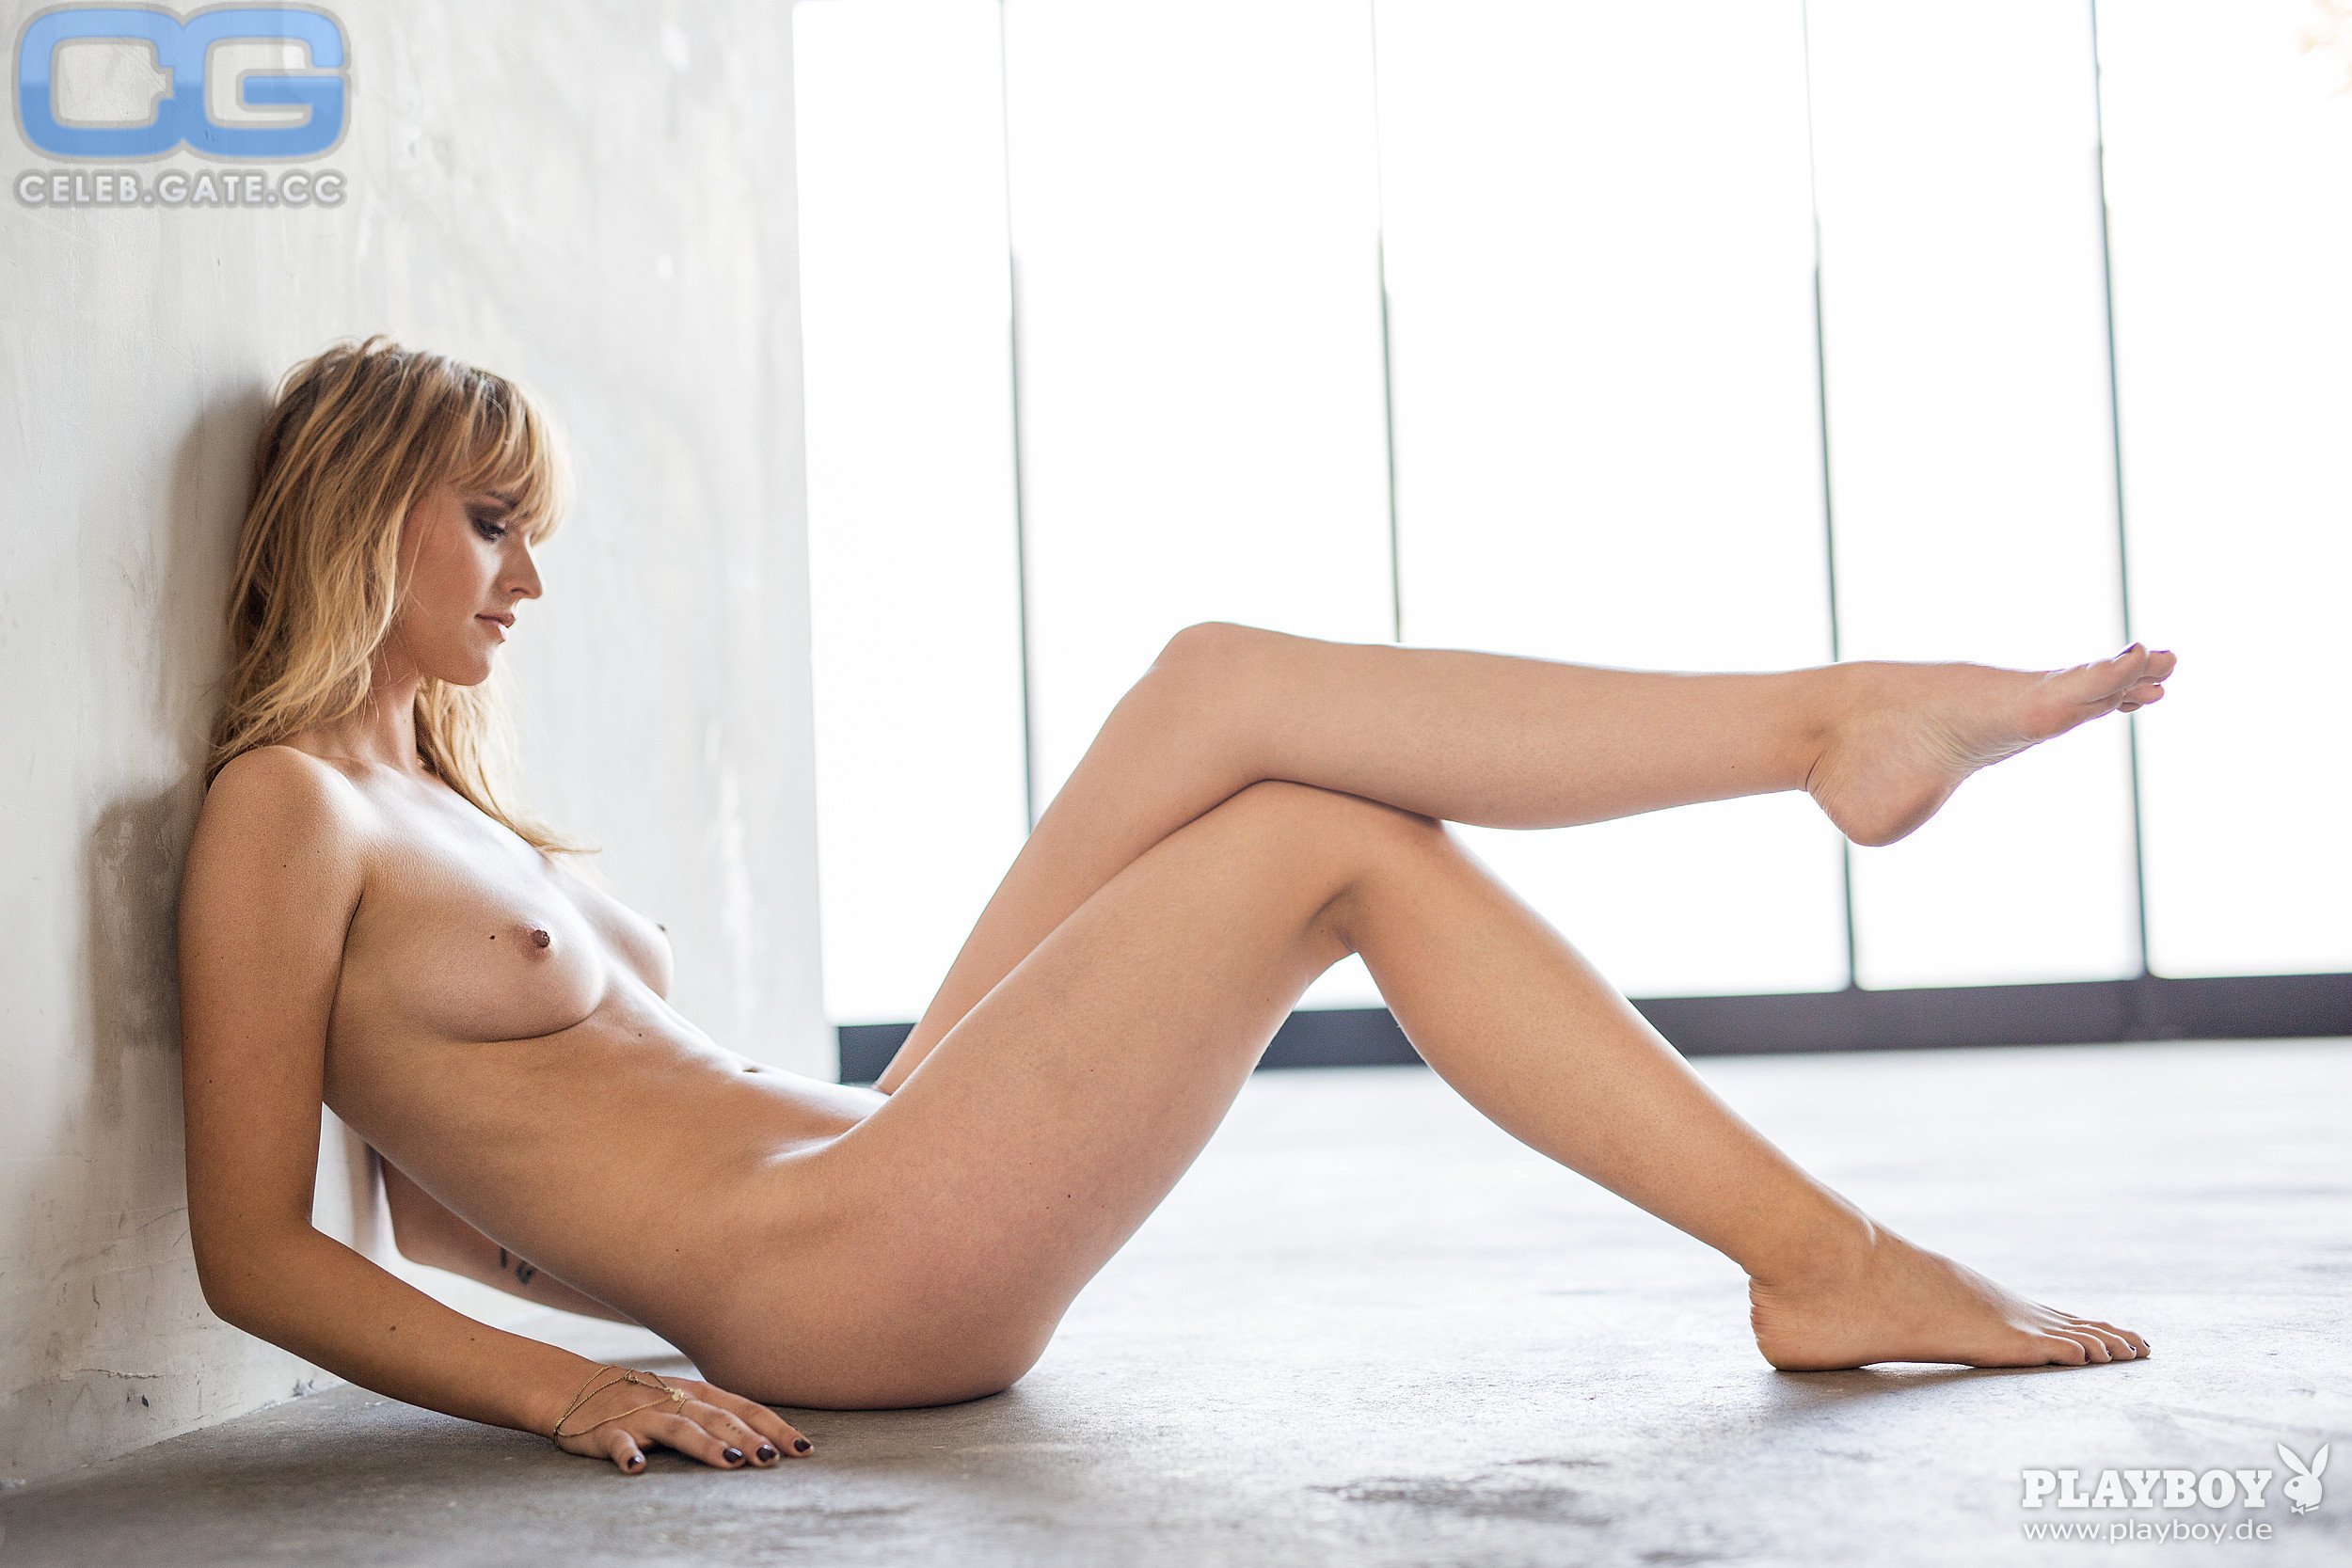 Playboy cosima viola Cosima Viola: